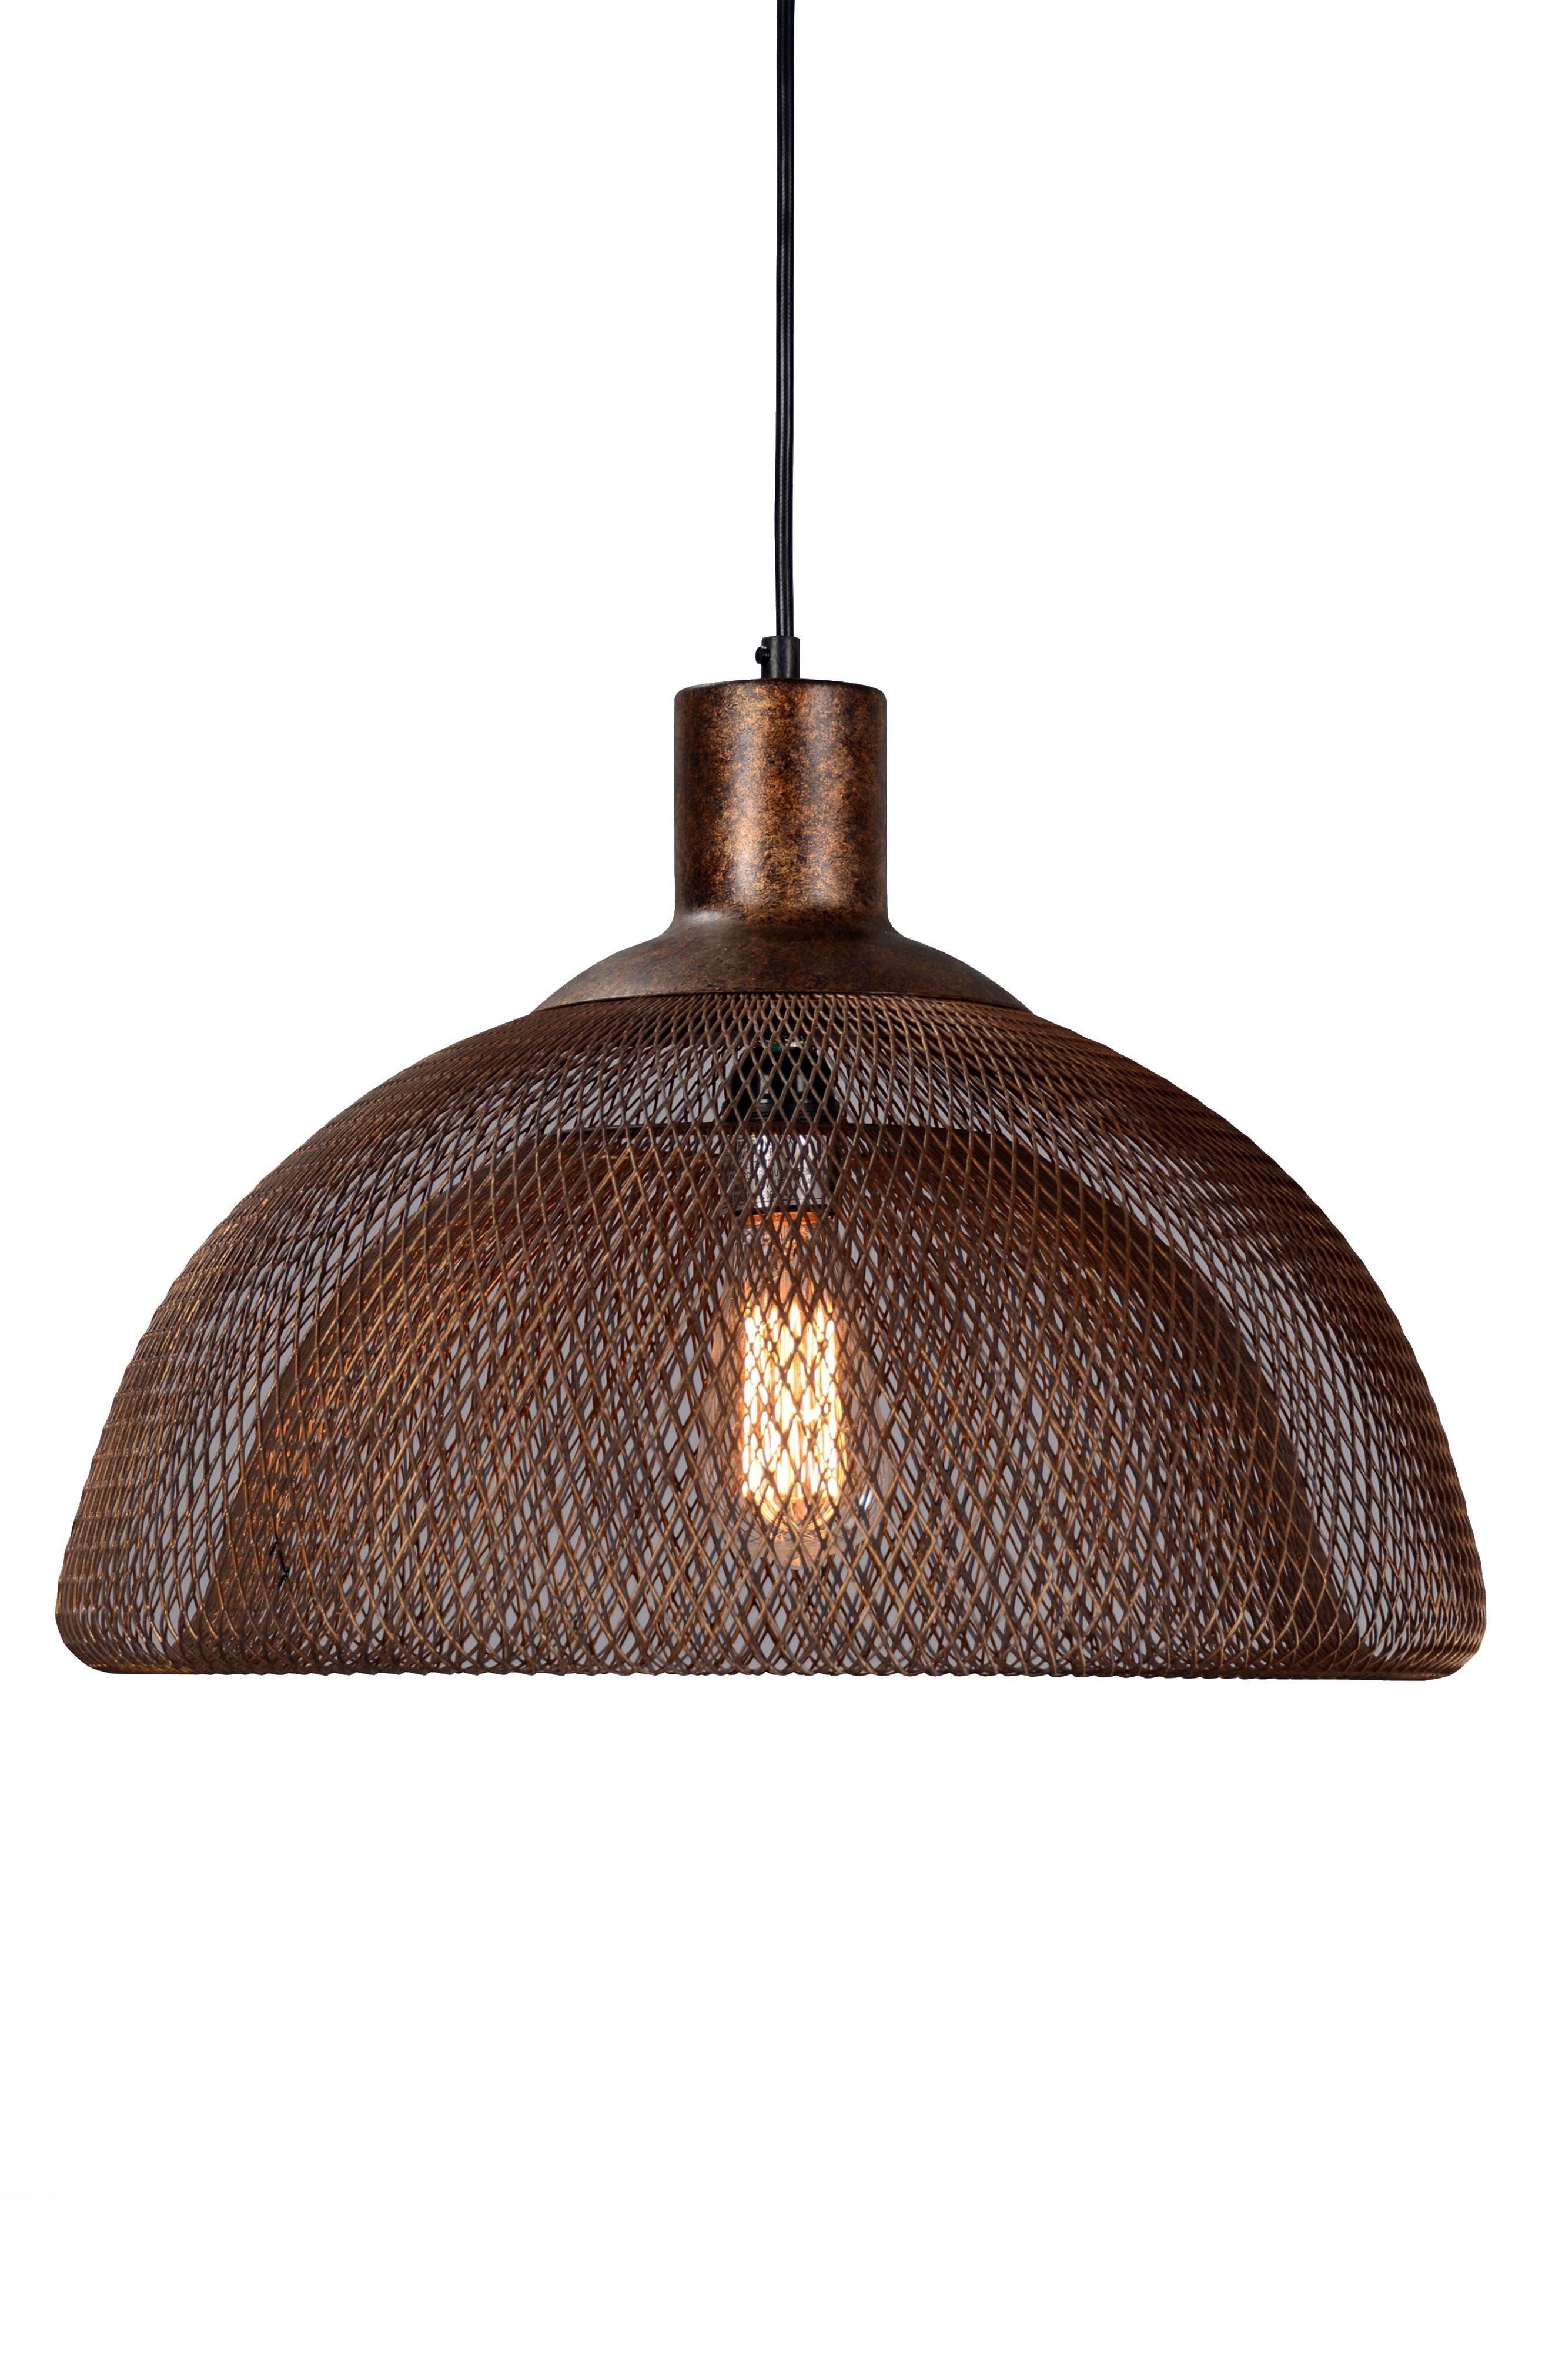 Classic Home Nova Copper Finish Mesh Shade Pendant Lamp